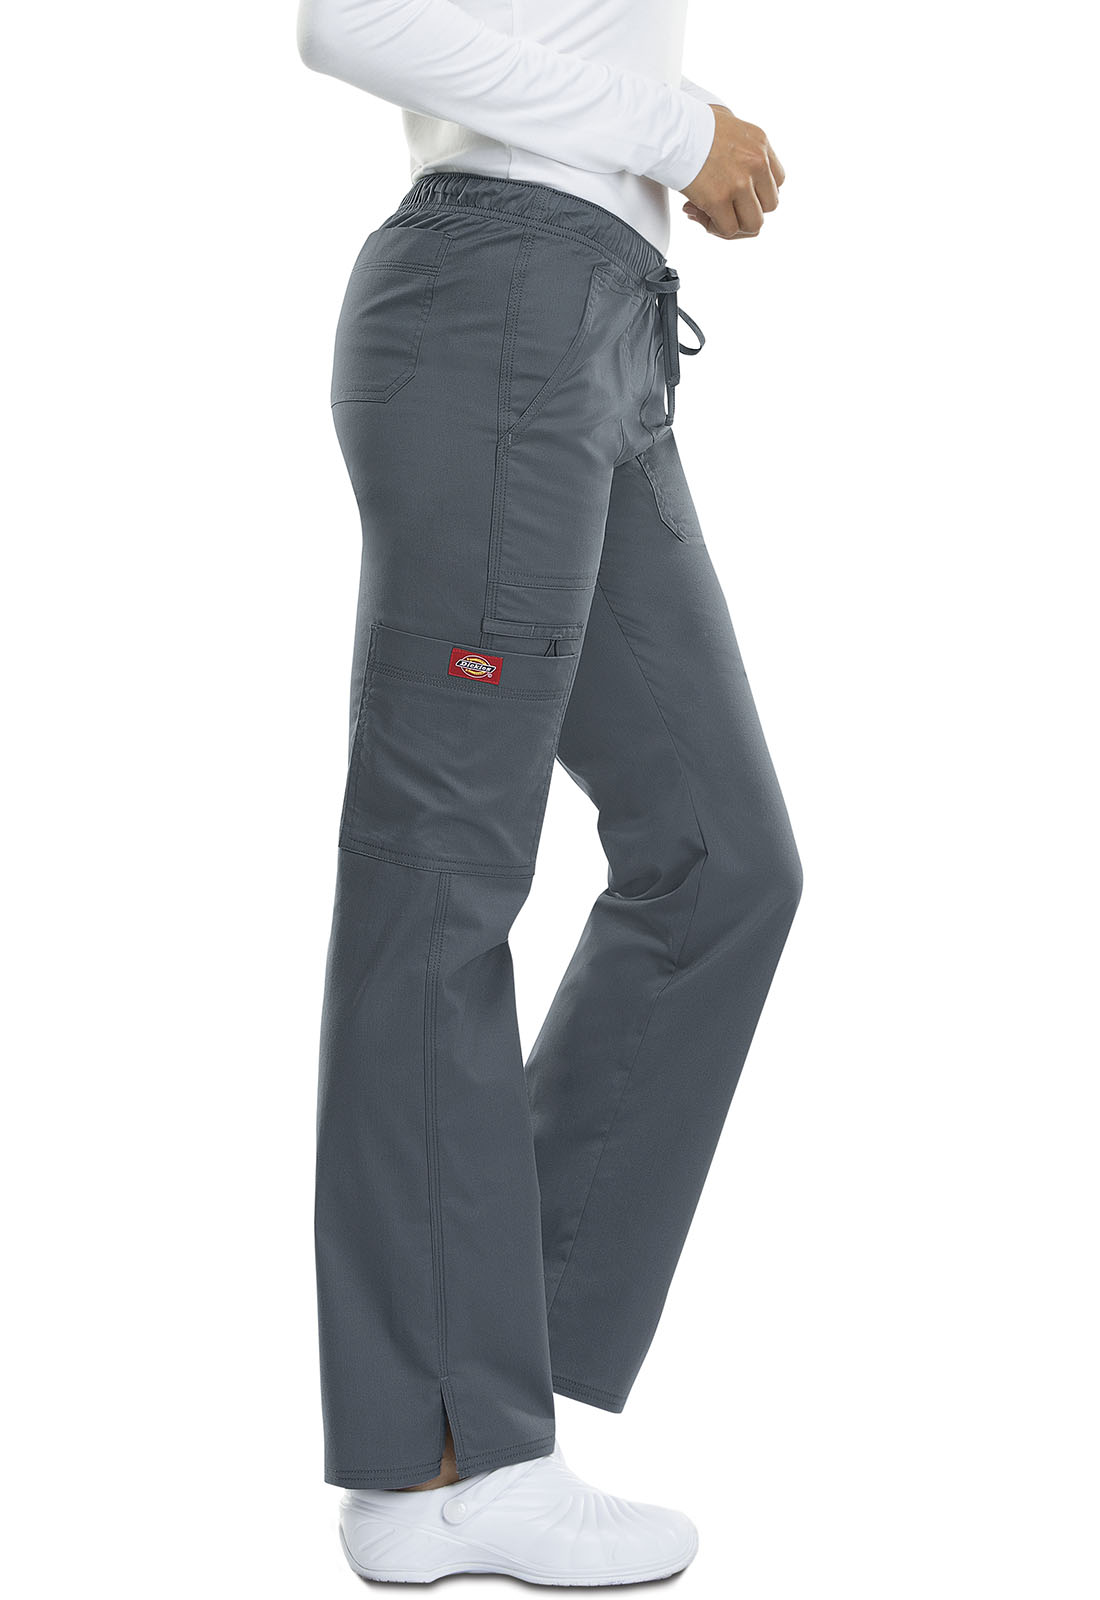 0b9f342767f Dickies Gen Flex Low Rise Straight Leg Drawstring Pant in Light Pewter